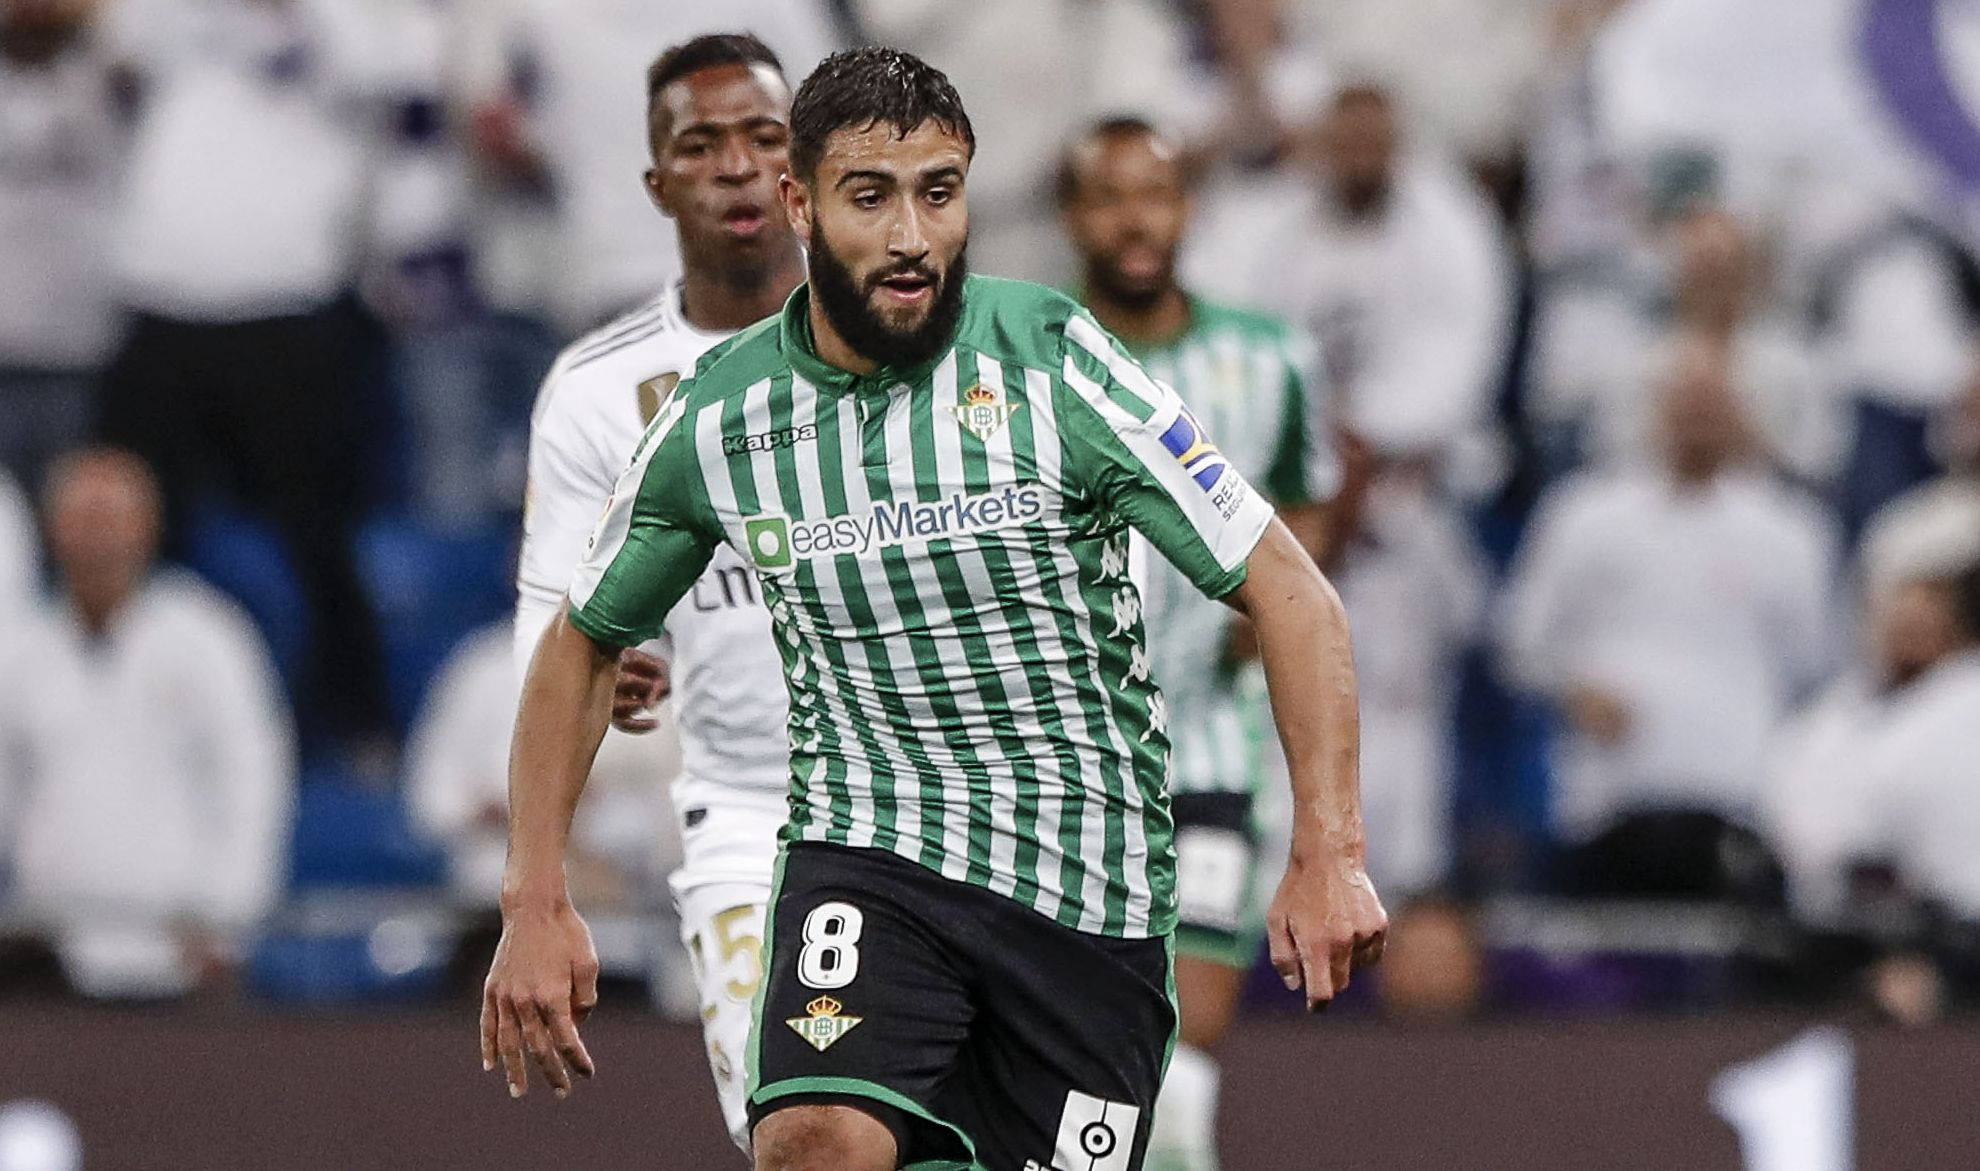 Football - Etranger - Liga : Séville FC-Betis en direct